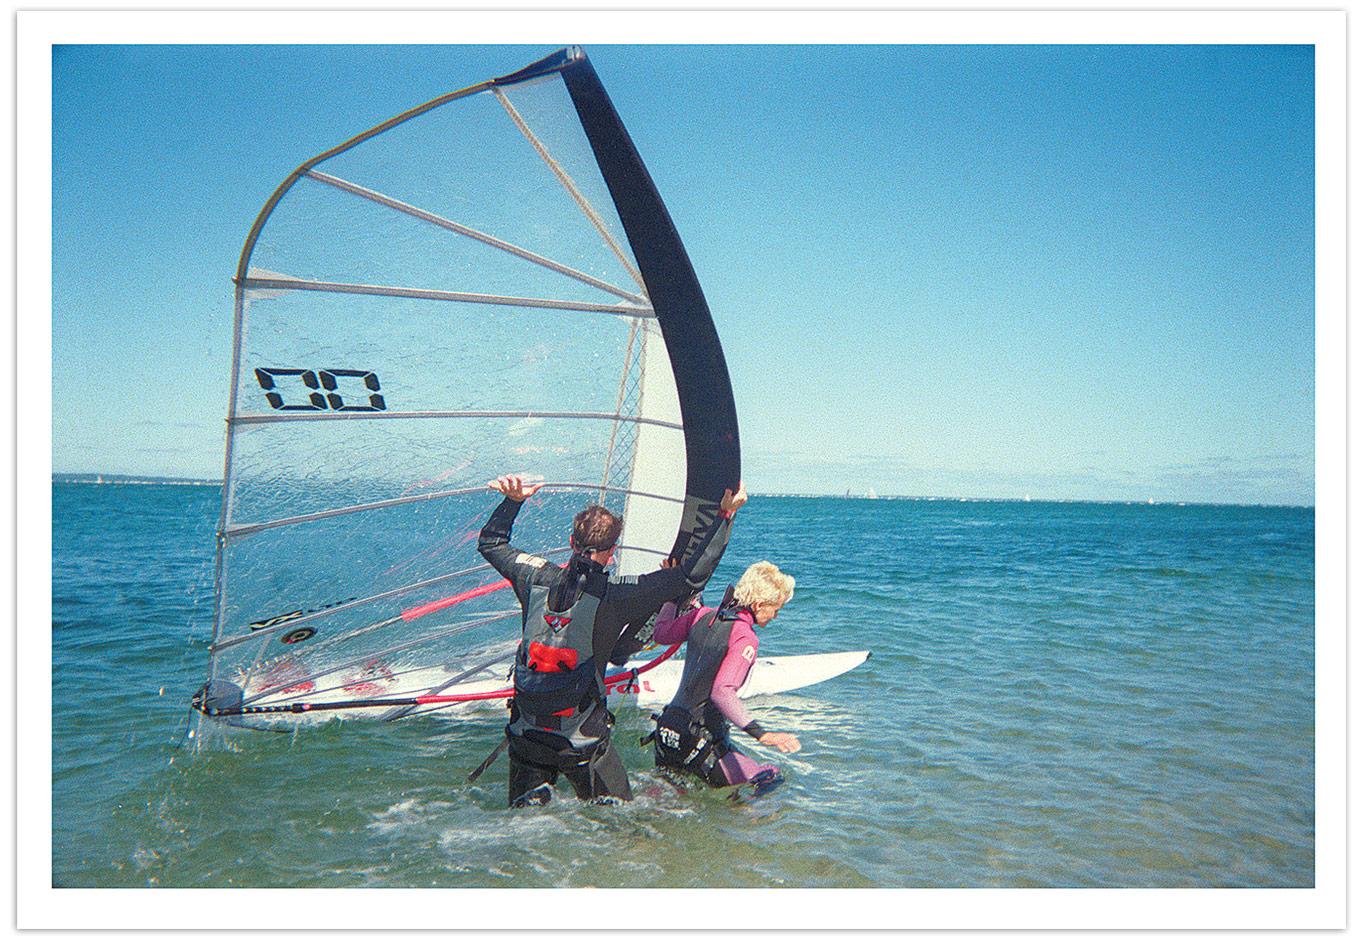 american_windsurfer-4.2_marthas-vineyard-windsurfing-challenge2